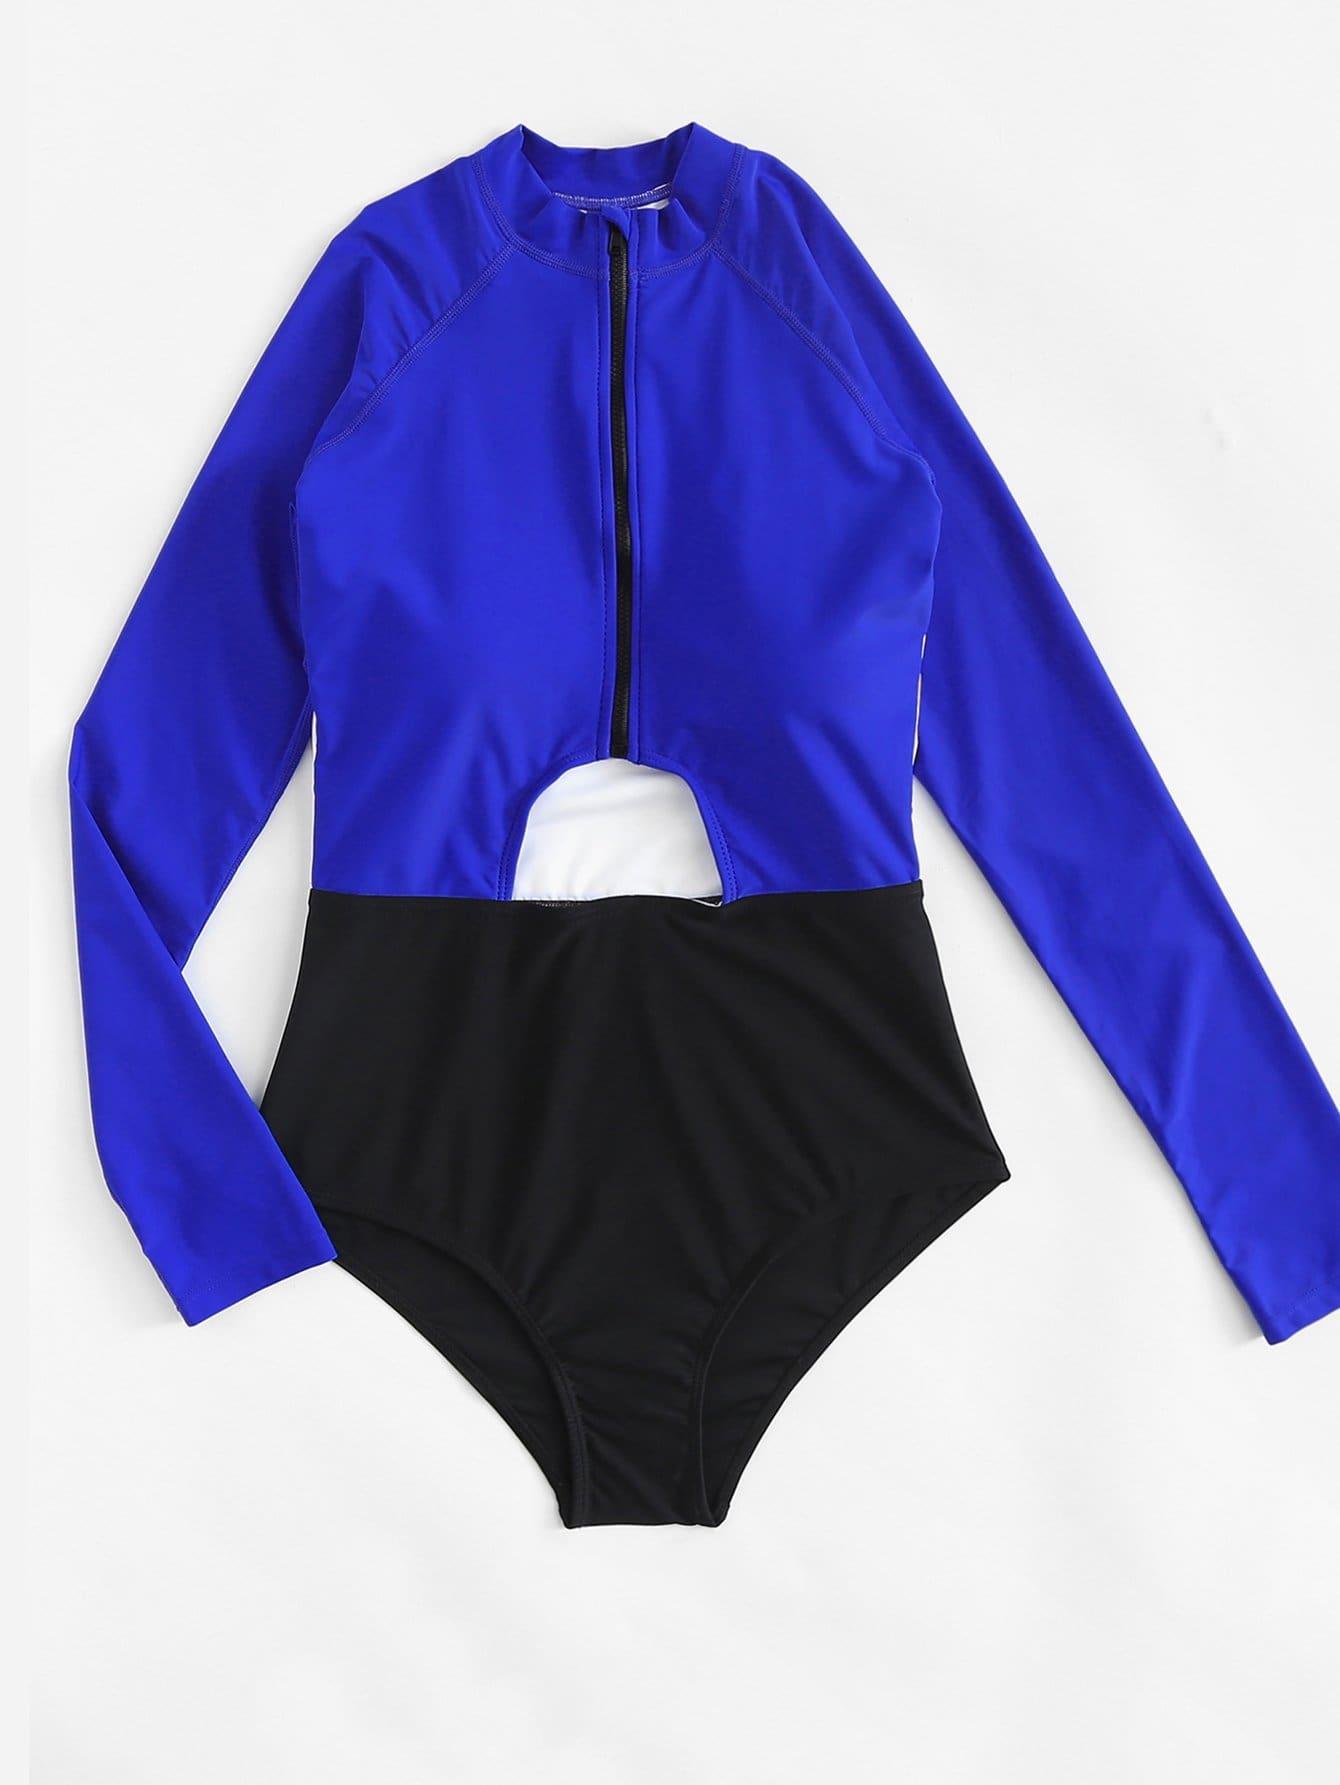 Cut Out Long Sleeve Swimsuit fishnet sheer long sleeve swimsuit